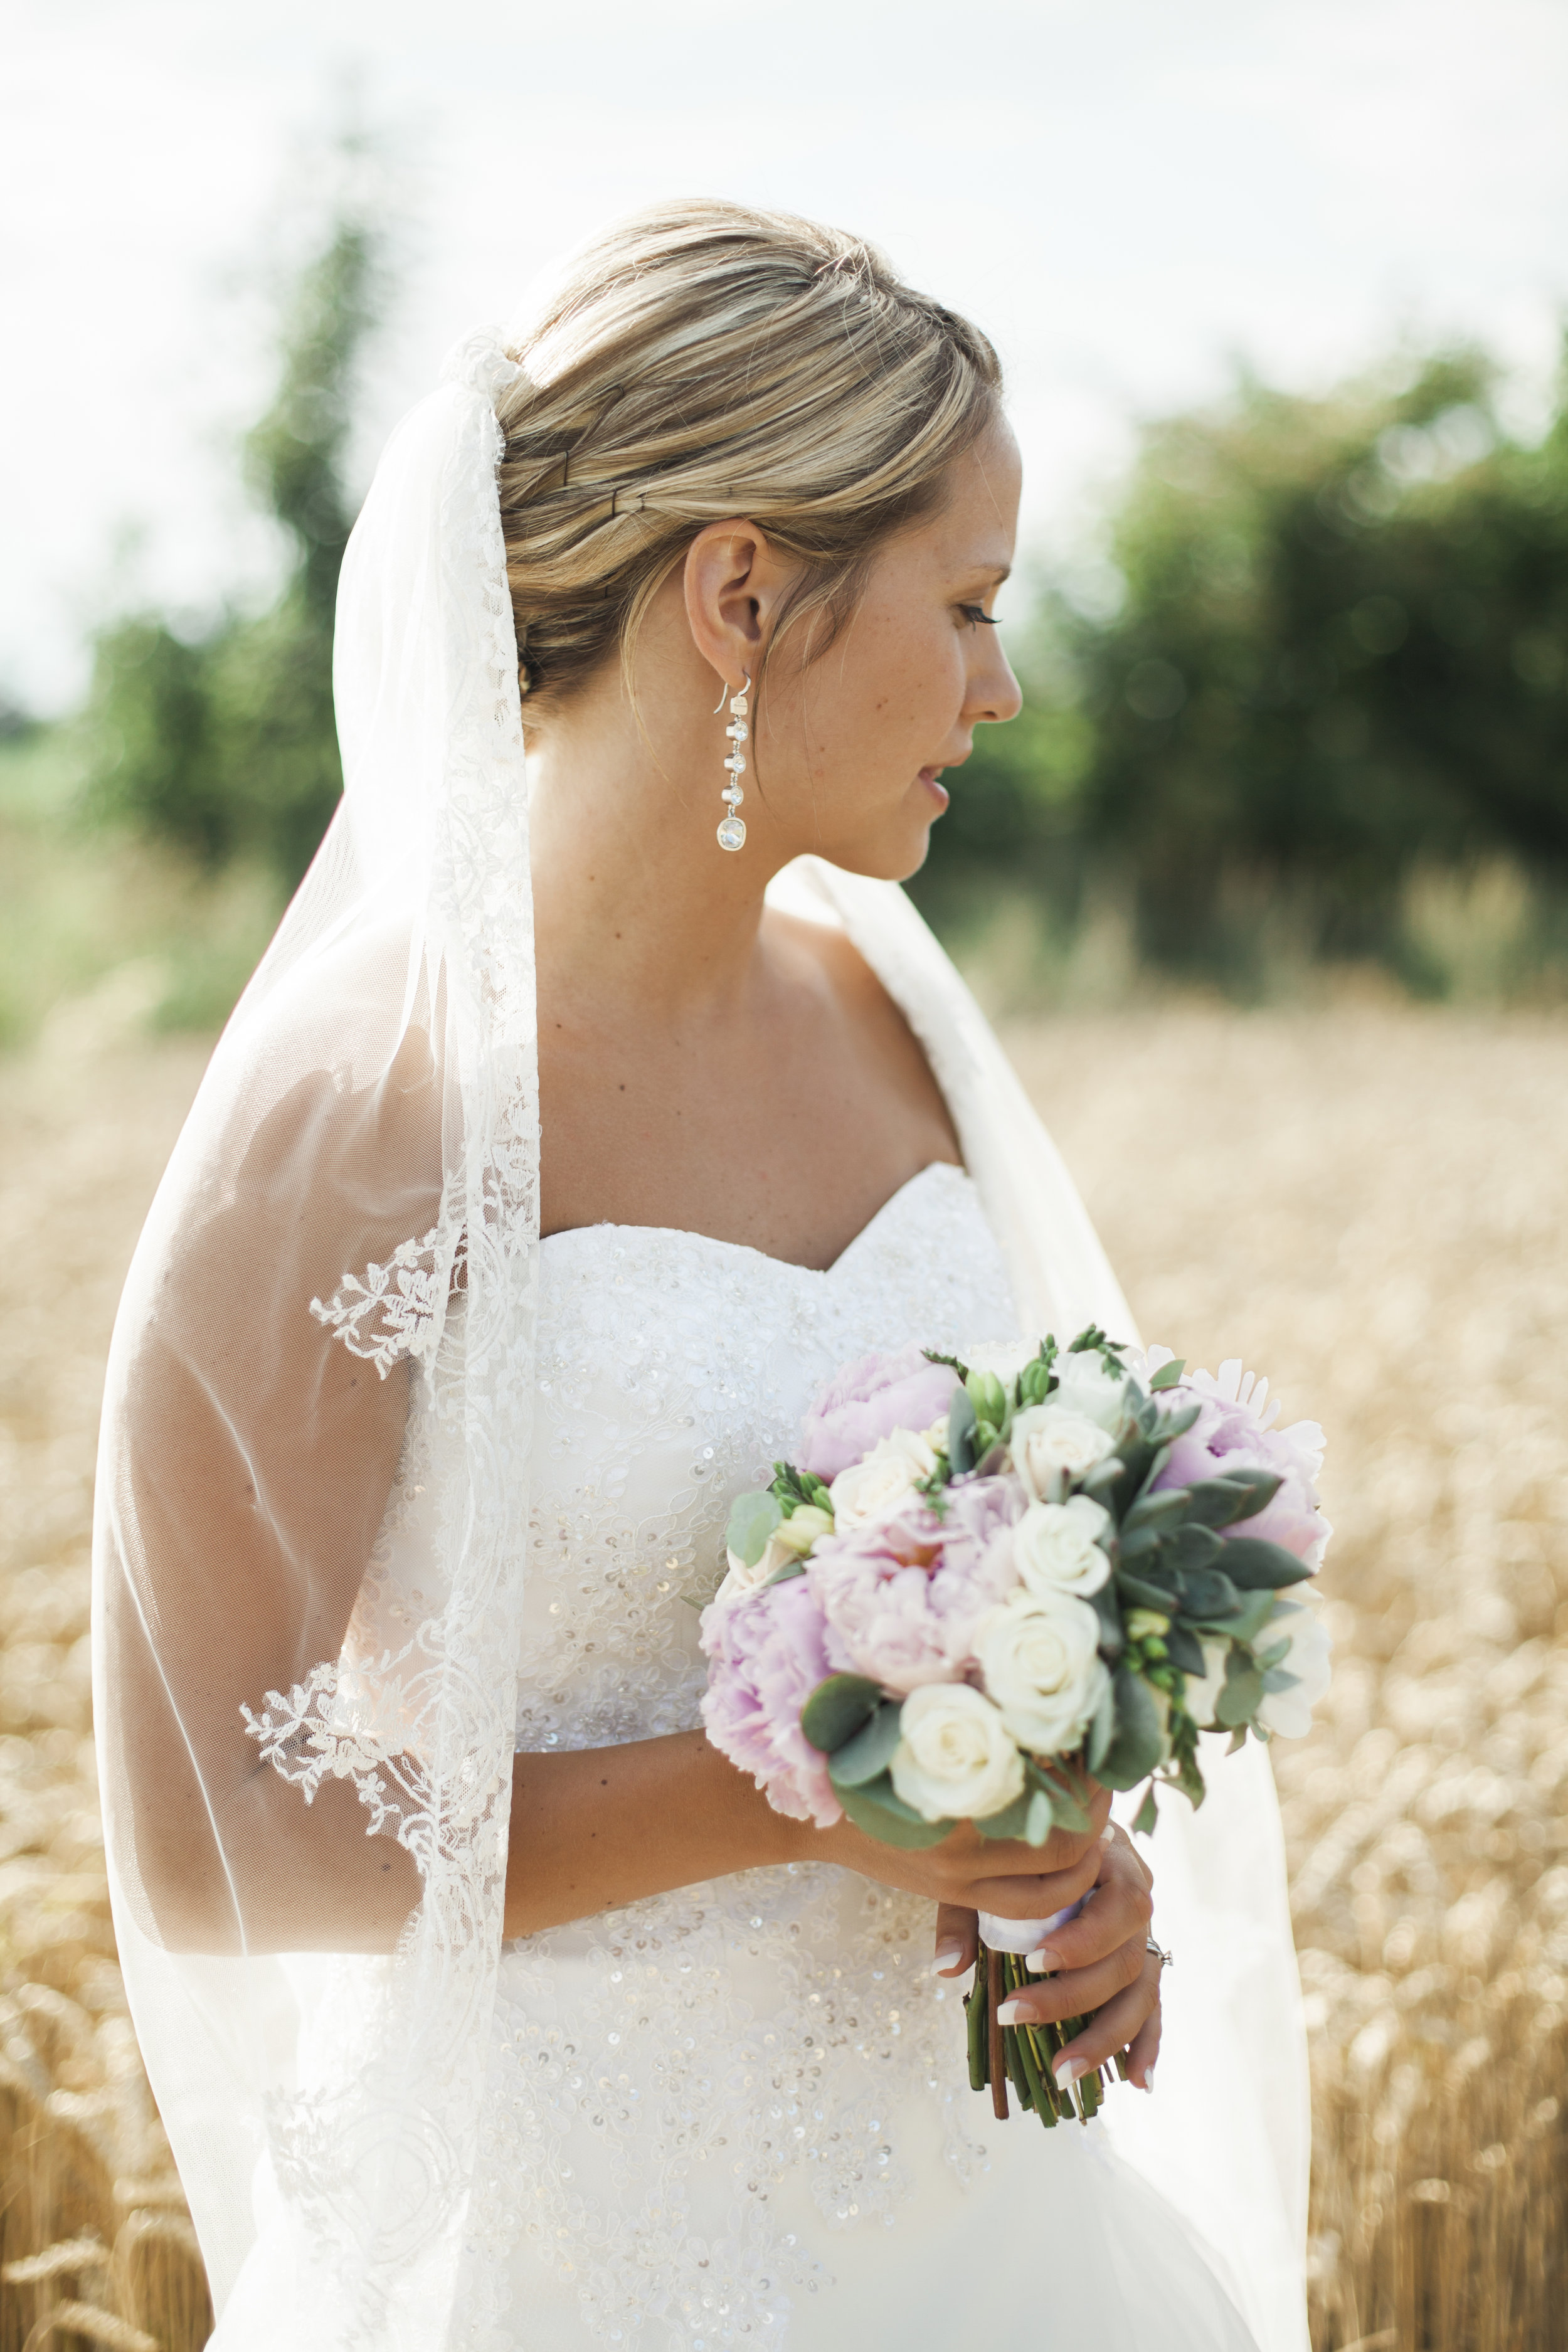 Bröllop-100.jpg